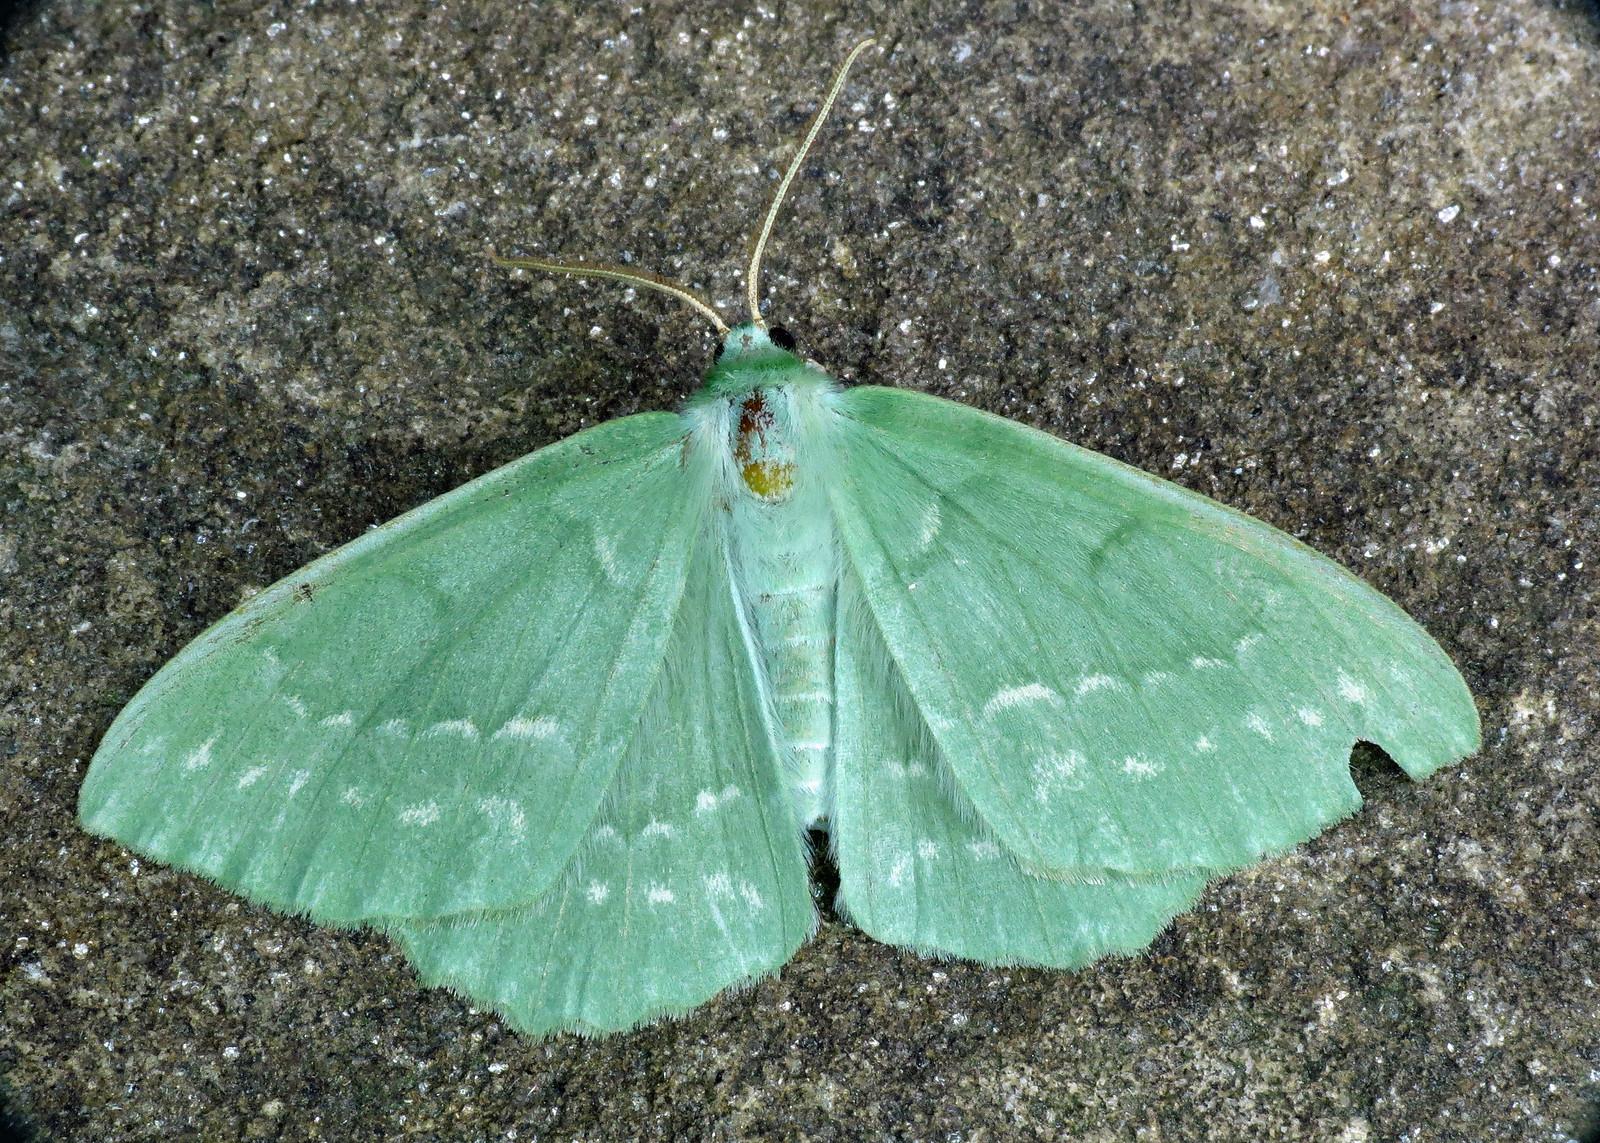 1666 Large Emerald - Geometra papilionaria